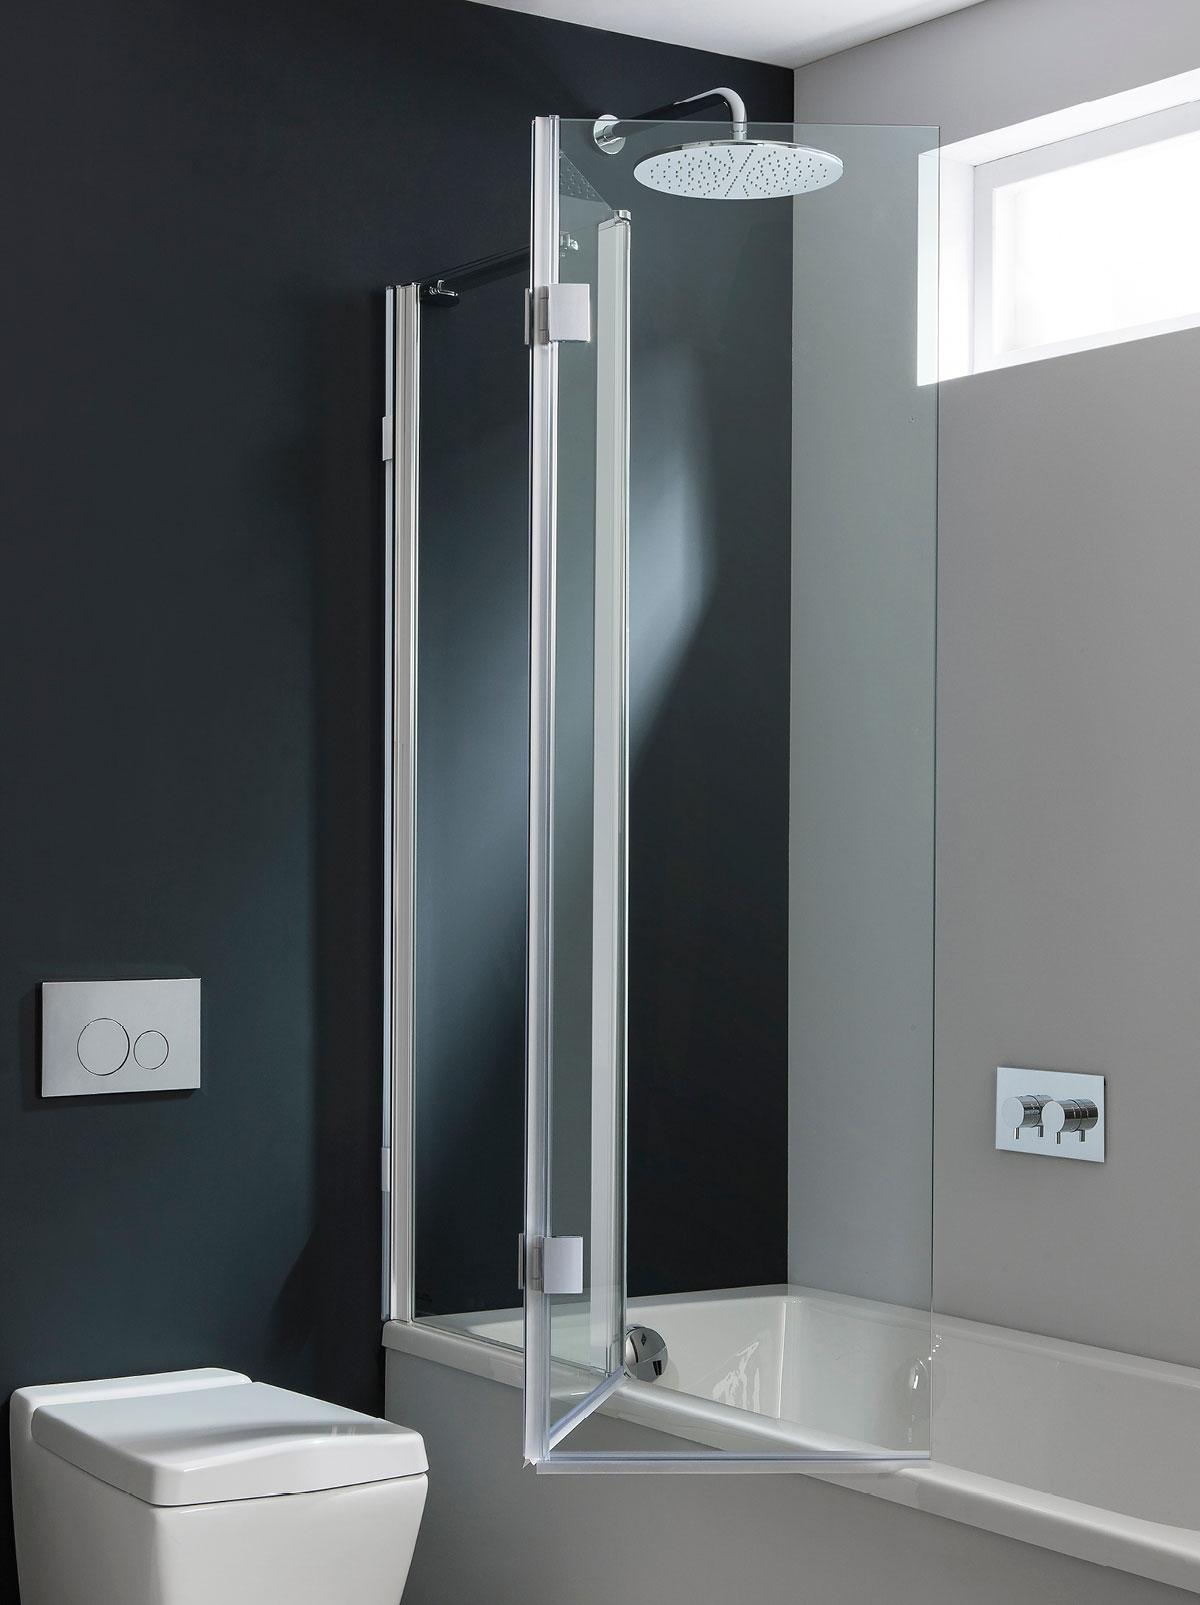 Design Triple Bath Screen in Frameless | Luxury bathrooms UK ...